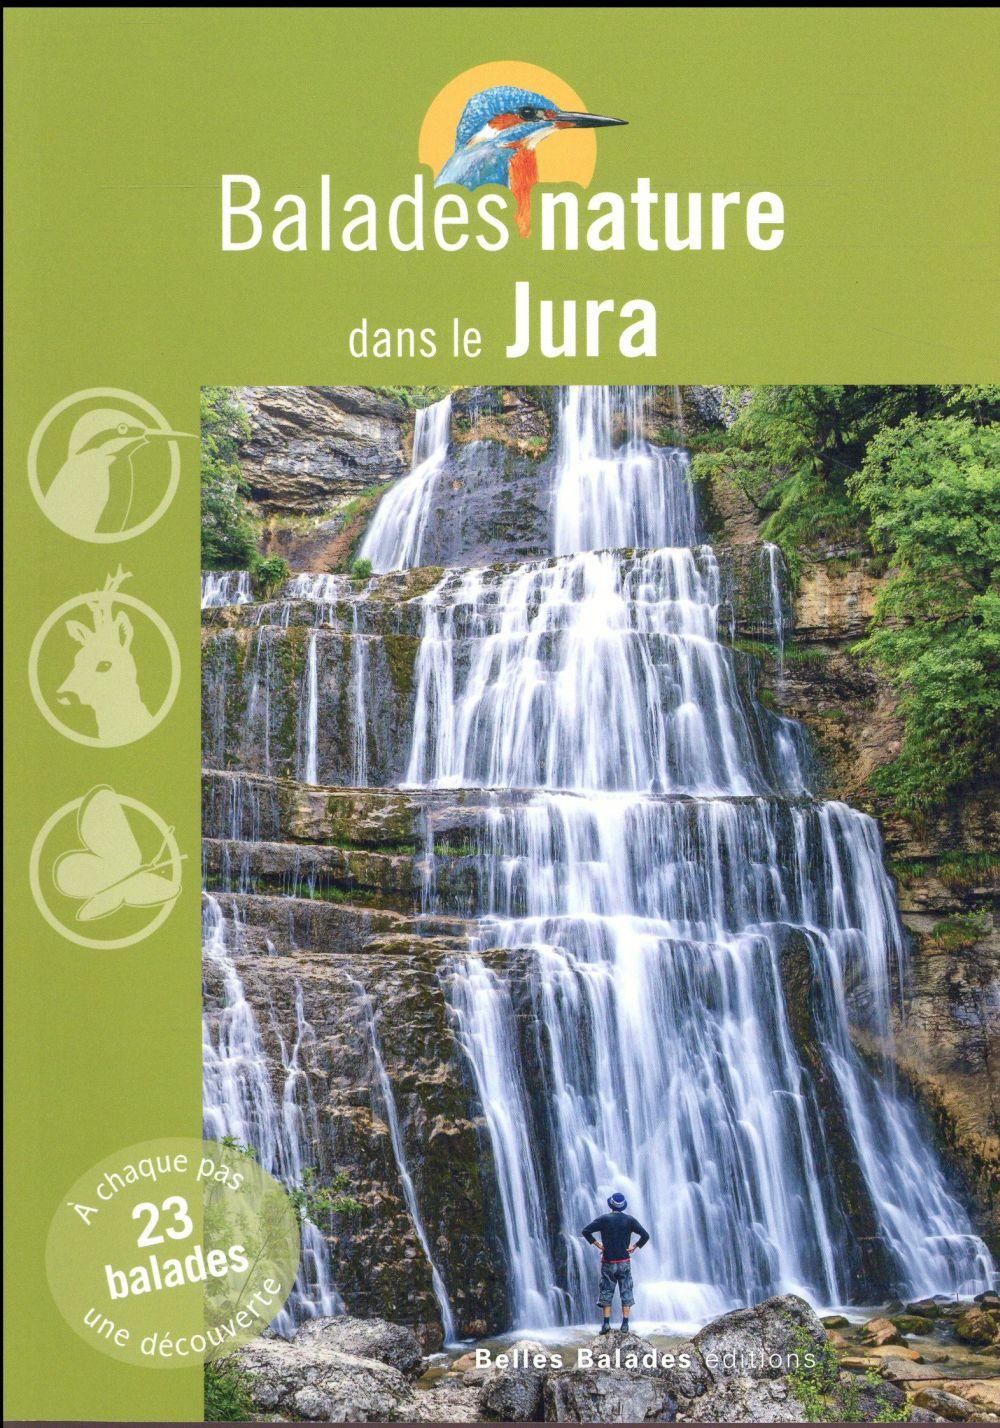 BALADES NATURE ; dans le Jura